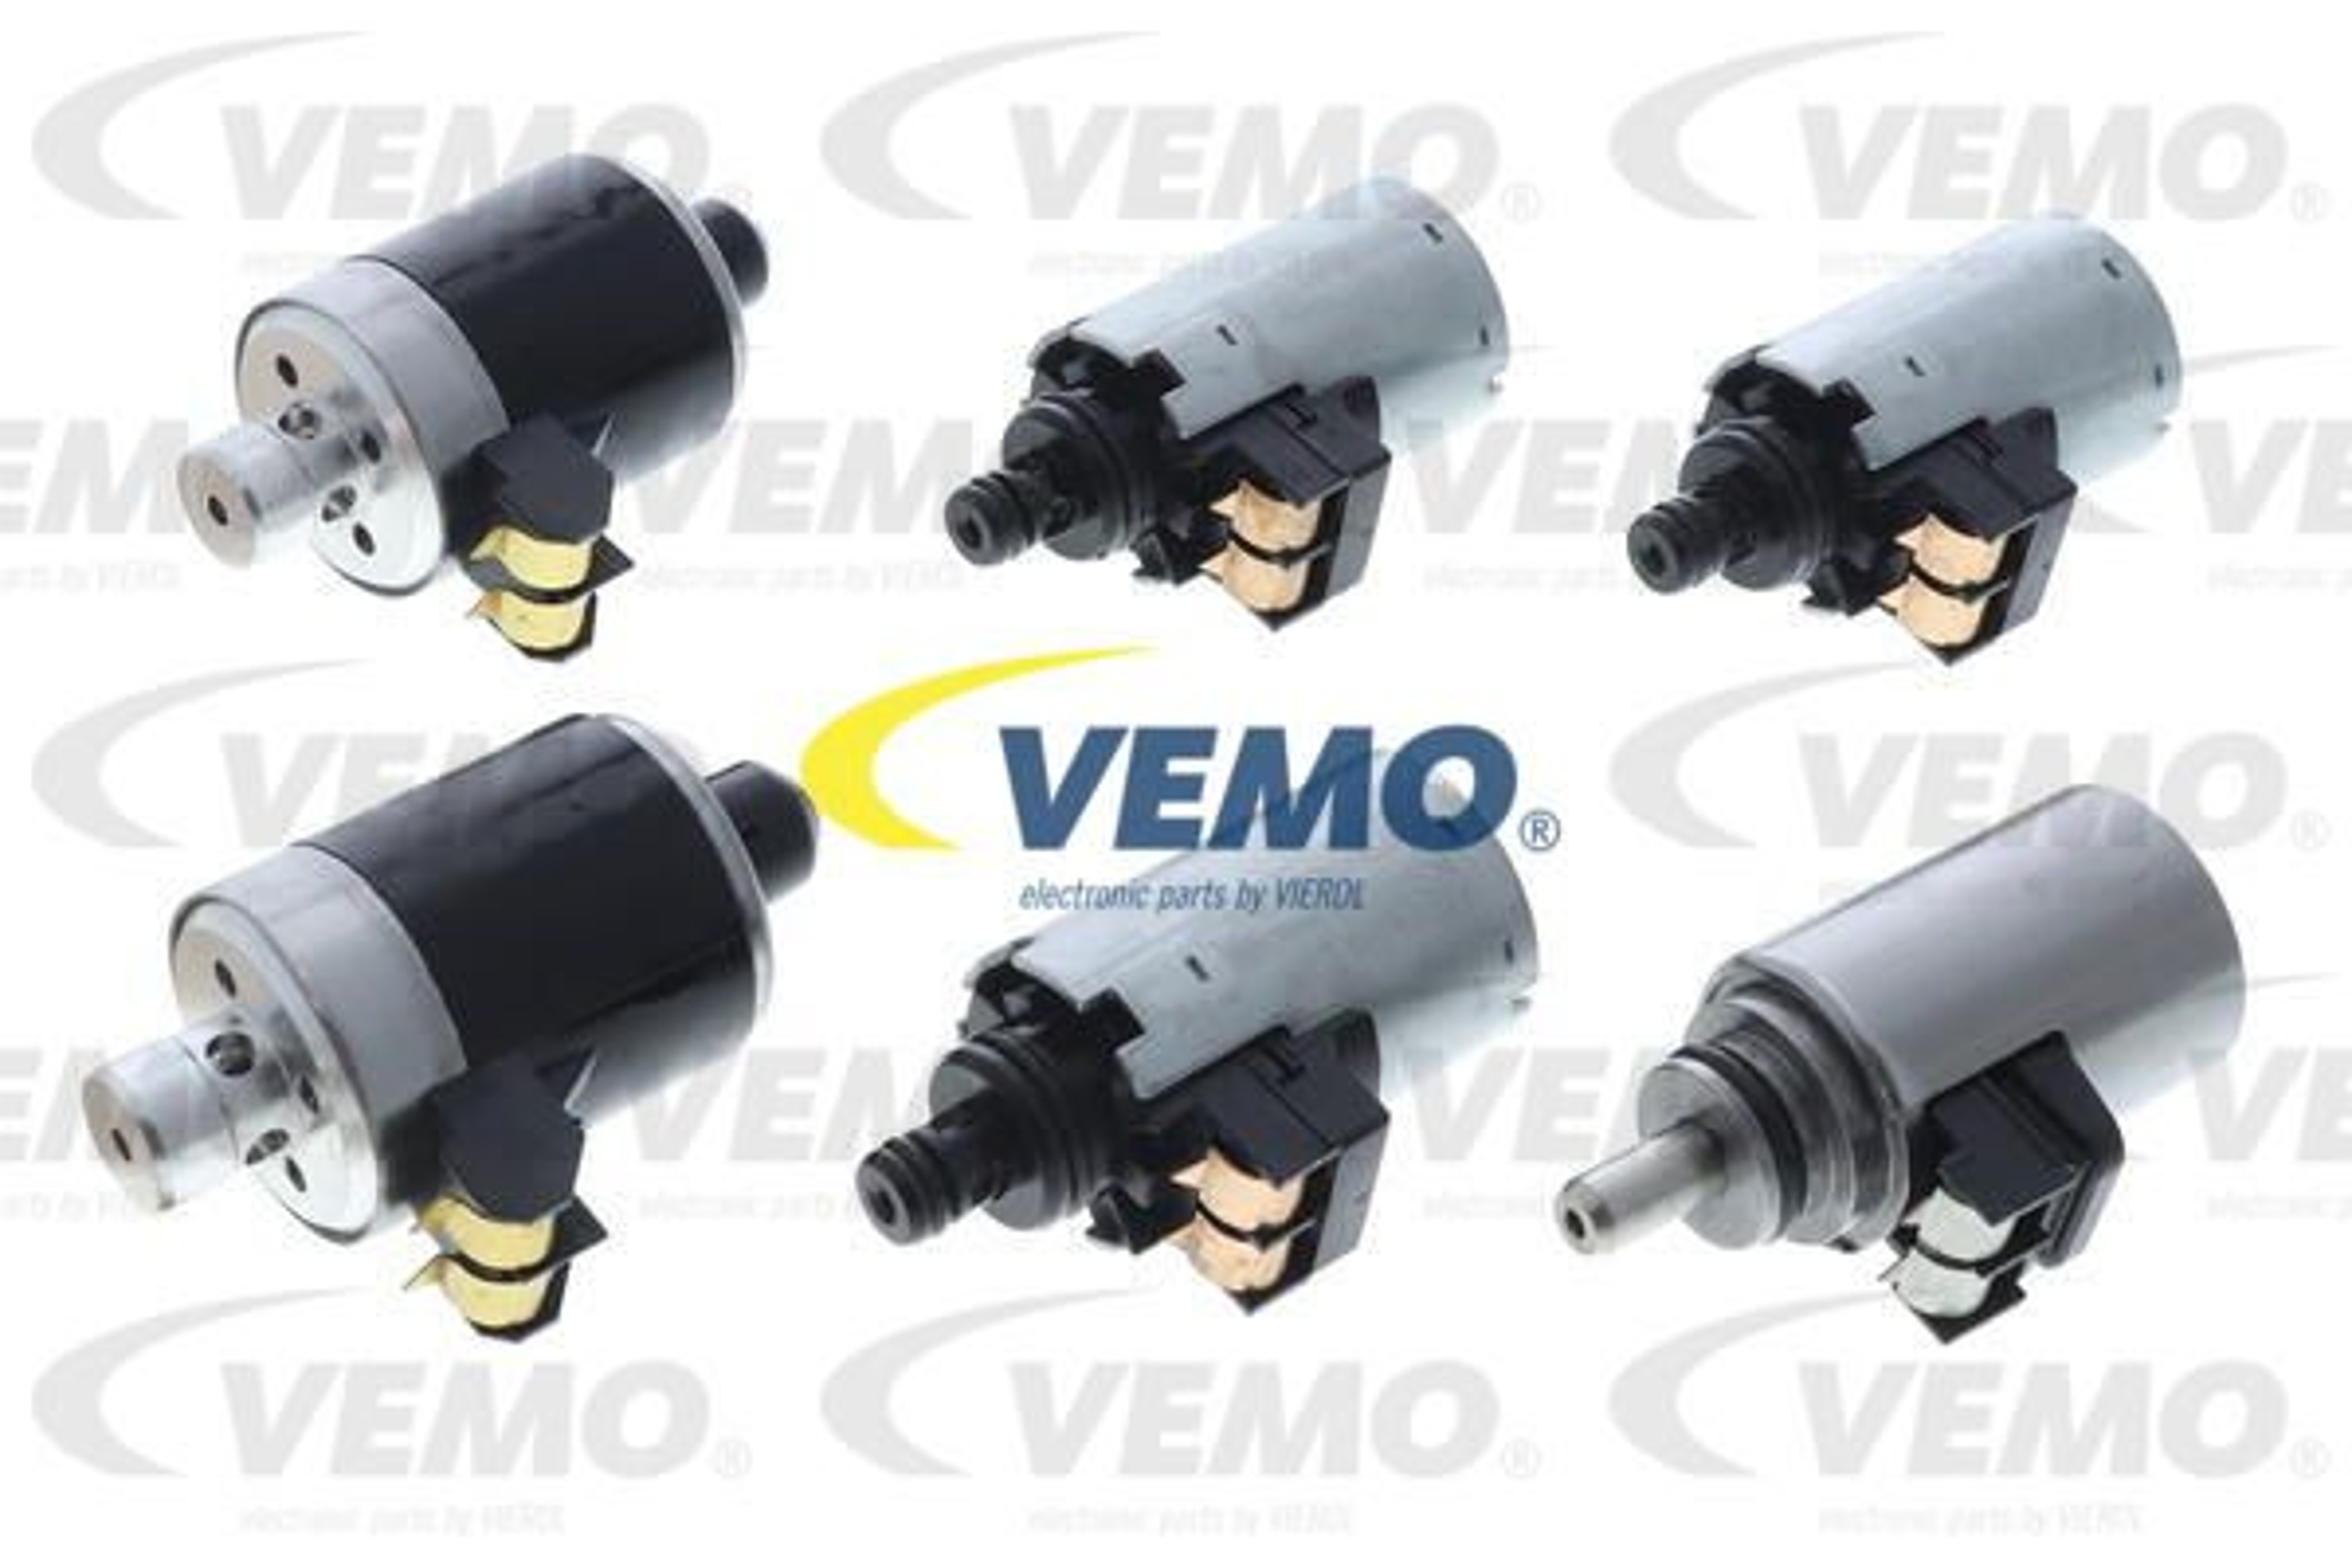 MERCEDES-BENZ E-Klasse 2014 Schaltventil, Automatikgetriebe - Original VEMO V30-77-0042